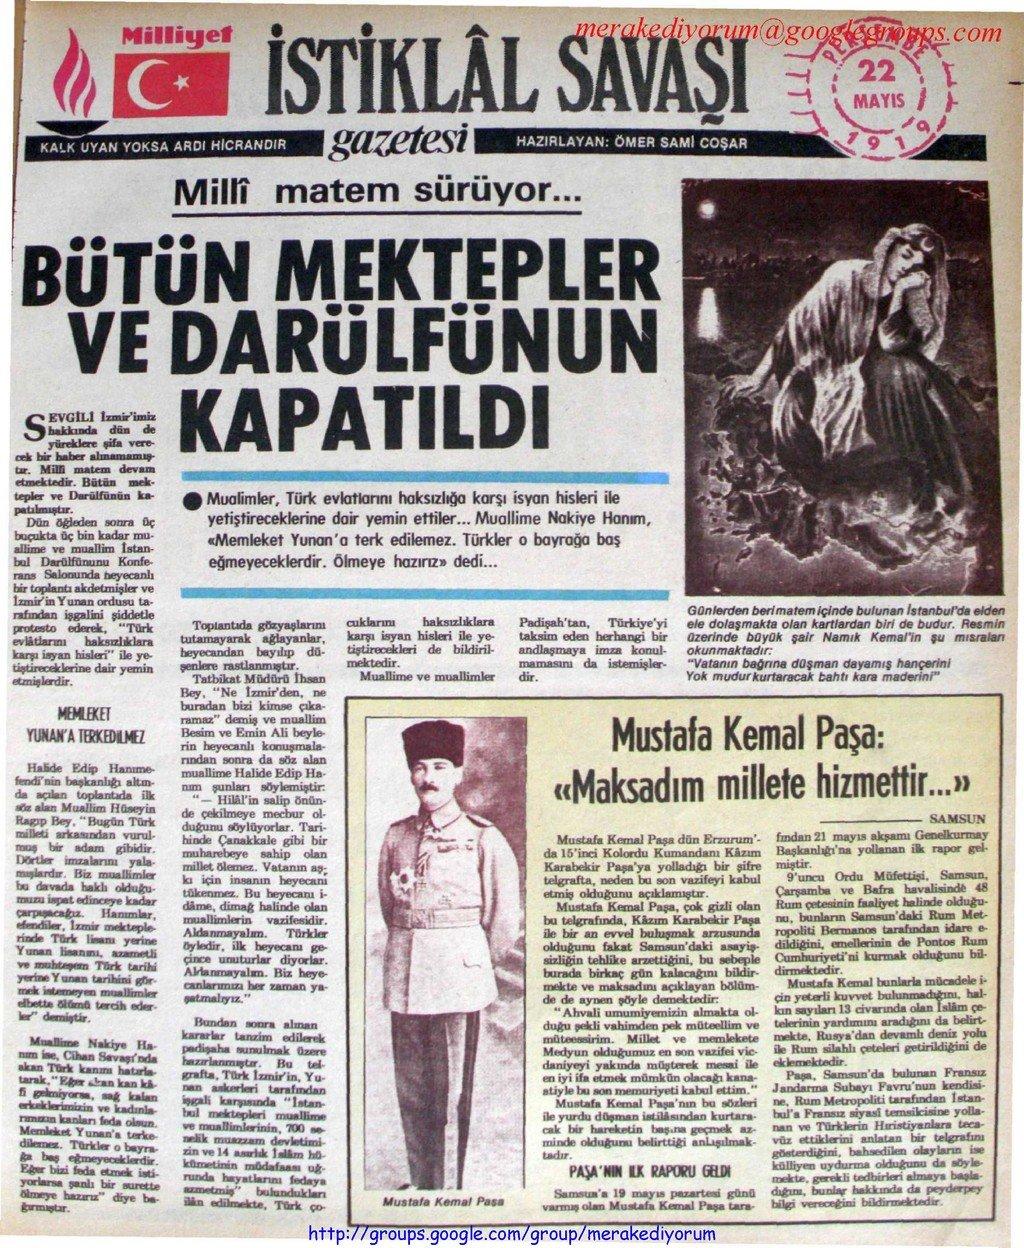 istiklal savaşı gazetesi - 22 mayıs 1919